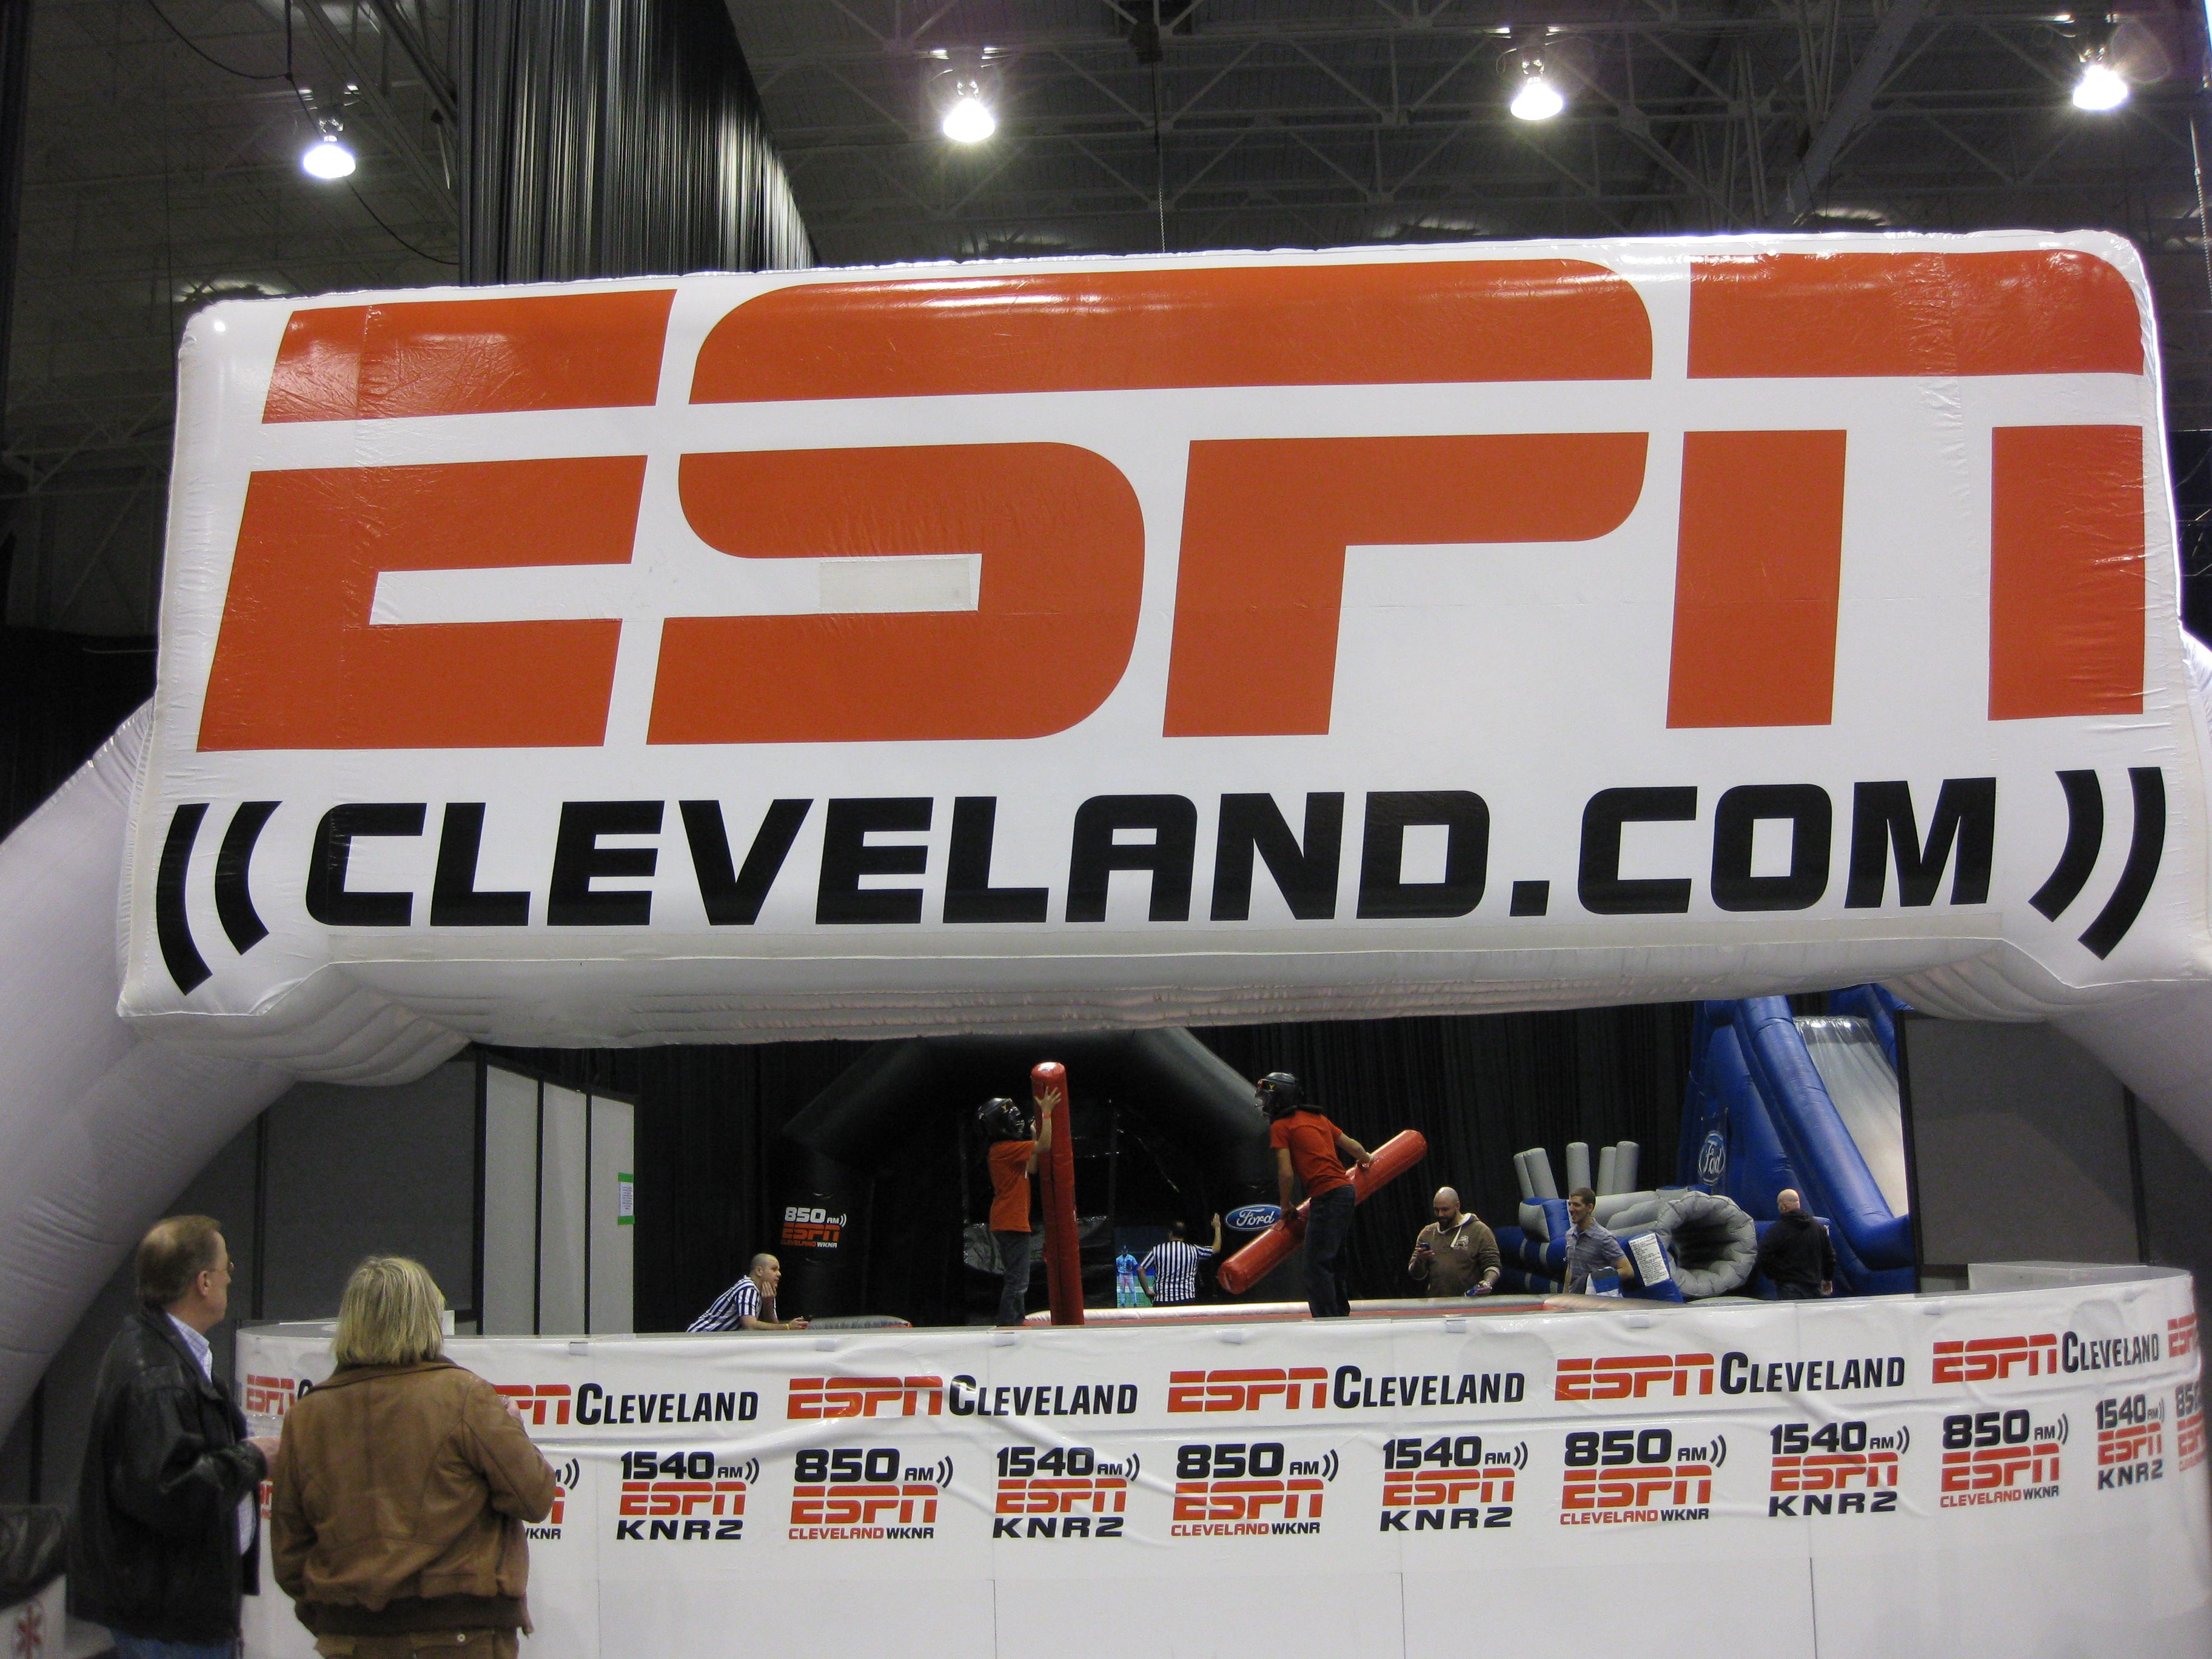 066565d792b4d489f3992d846f56a04e - How To Get Free Tickets To The Cleveland Auto Show